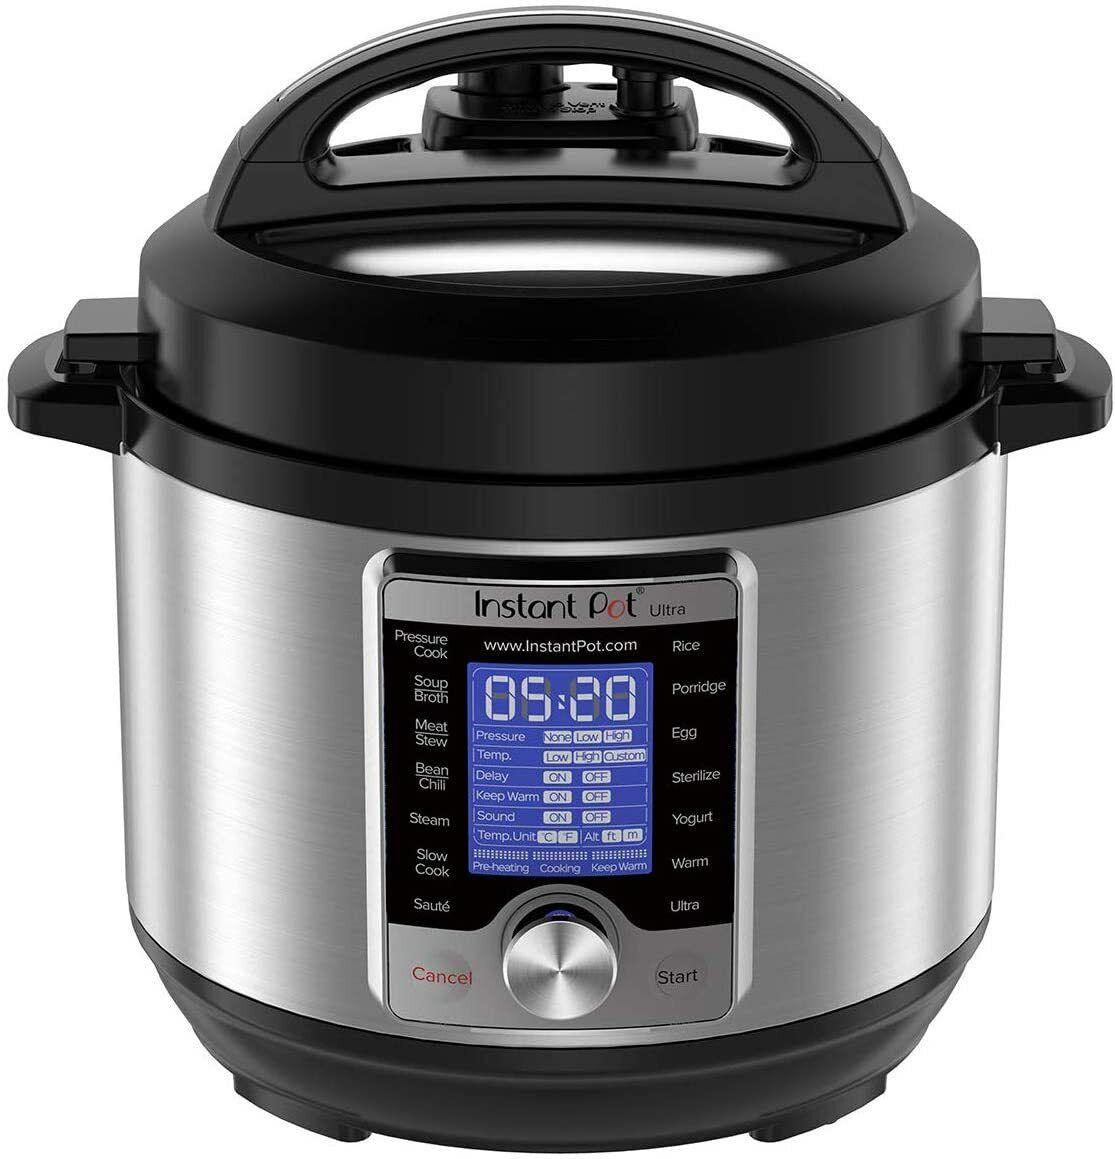 Instant Pot Ultra 10-in-1 Programmable Pressure Cooker 3qt -